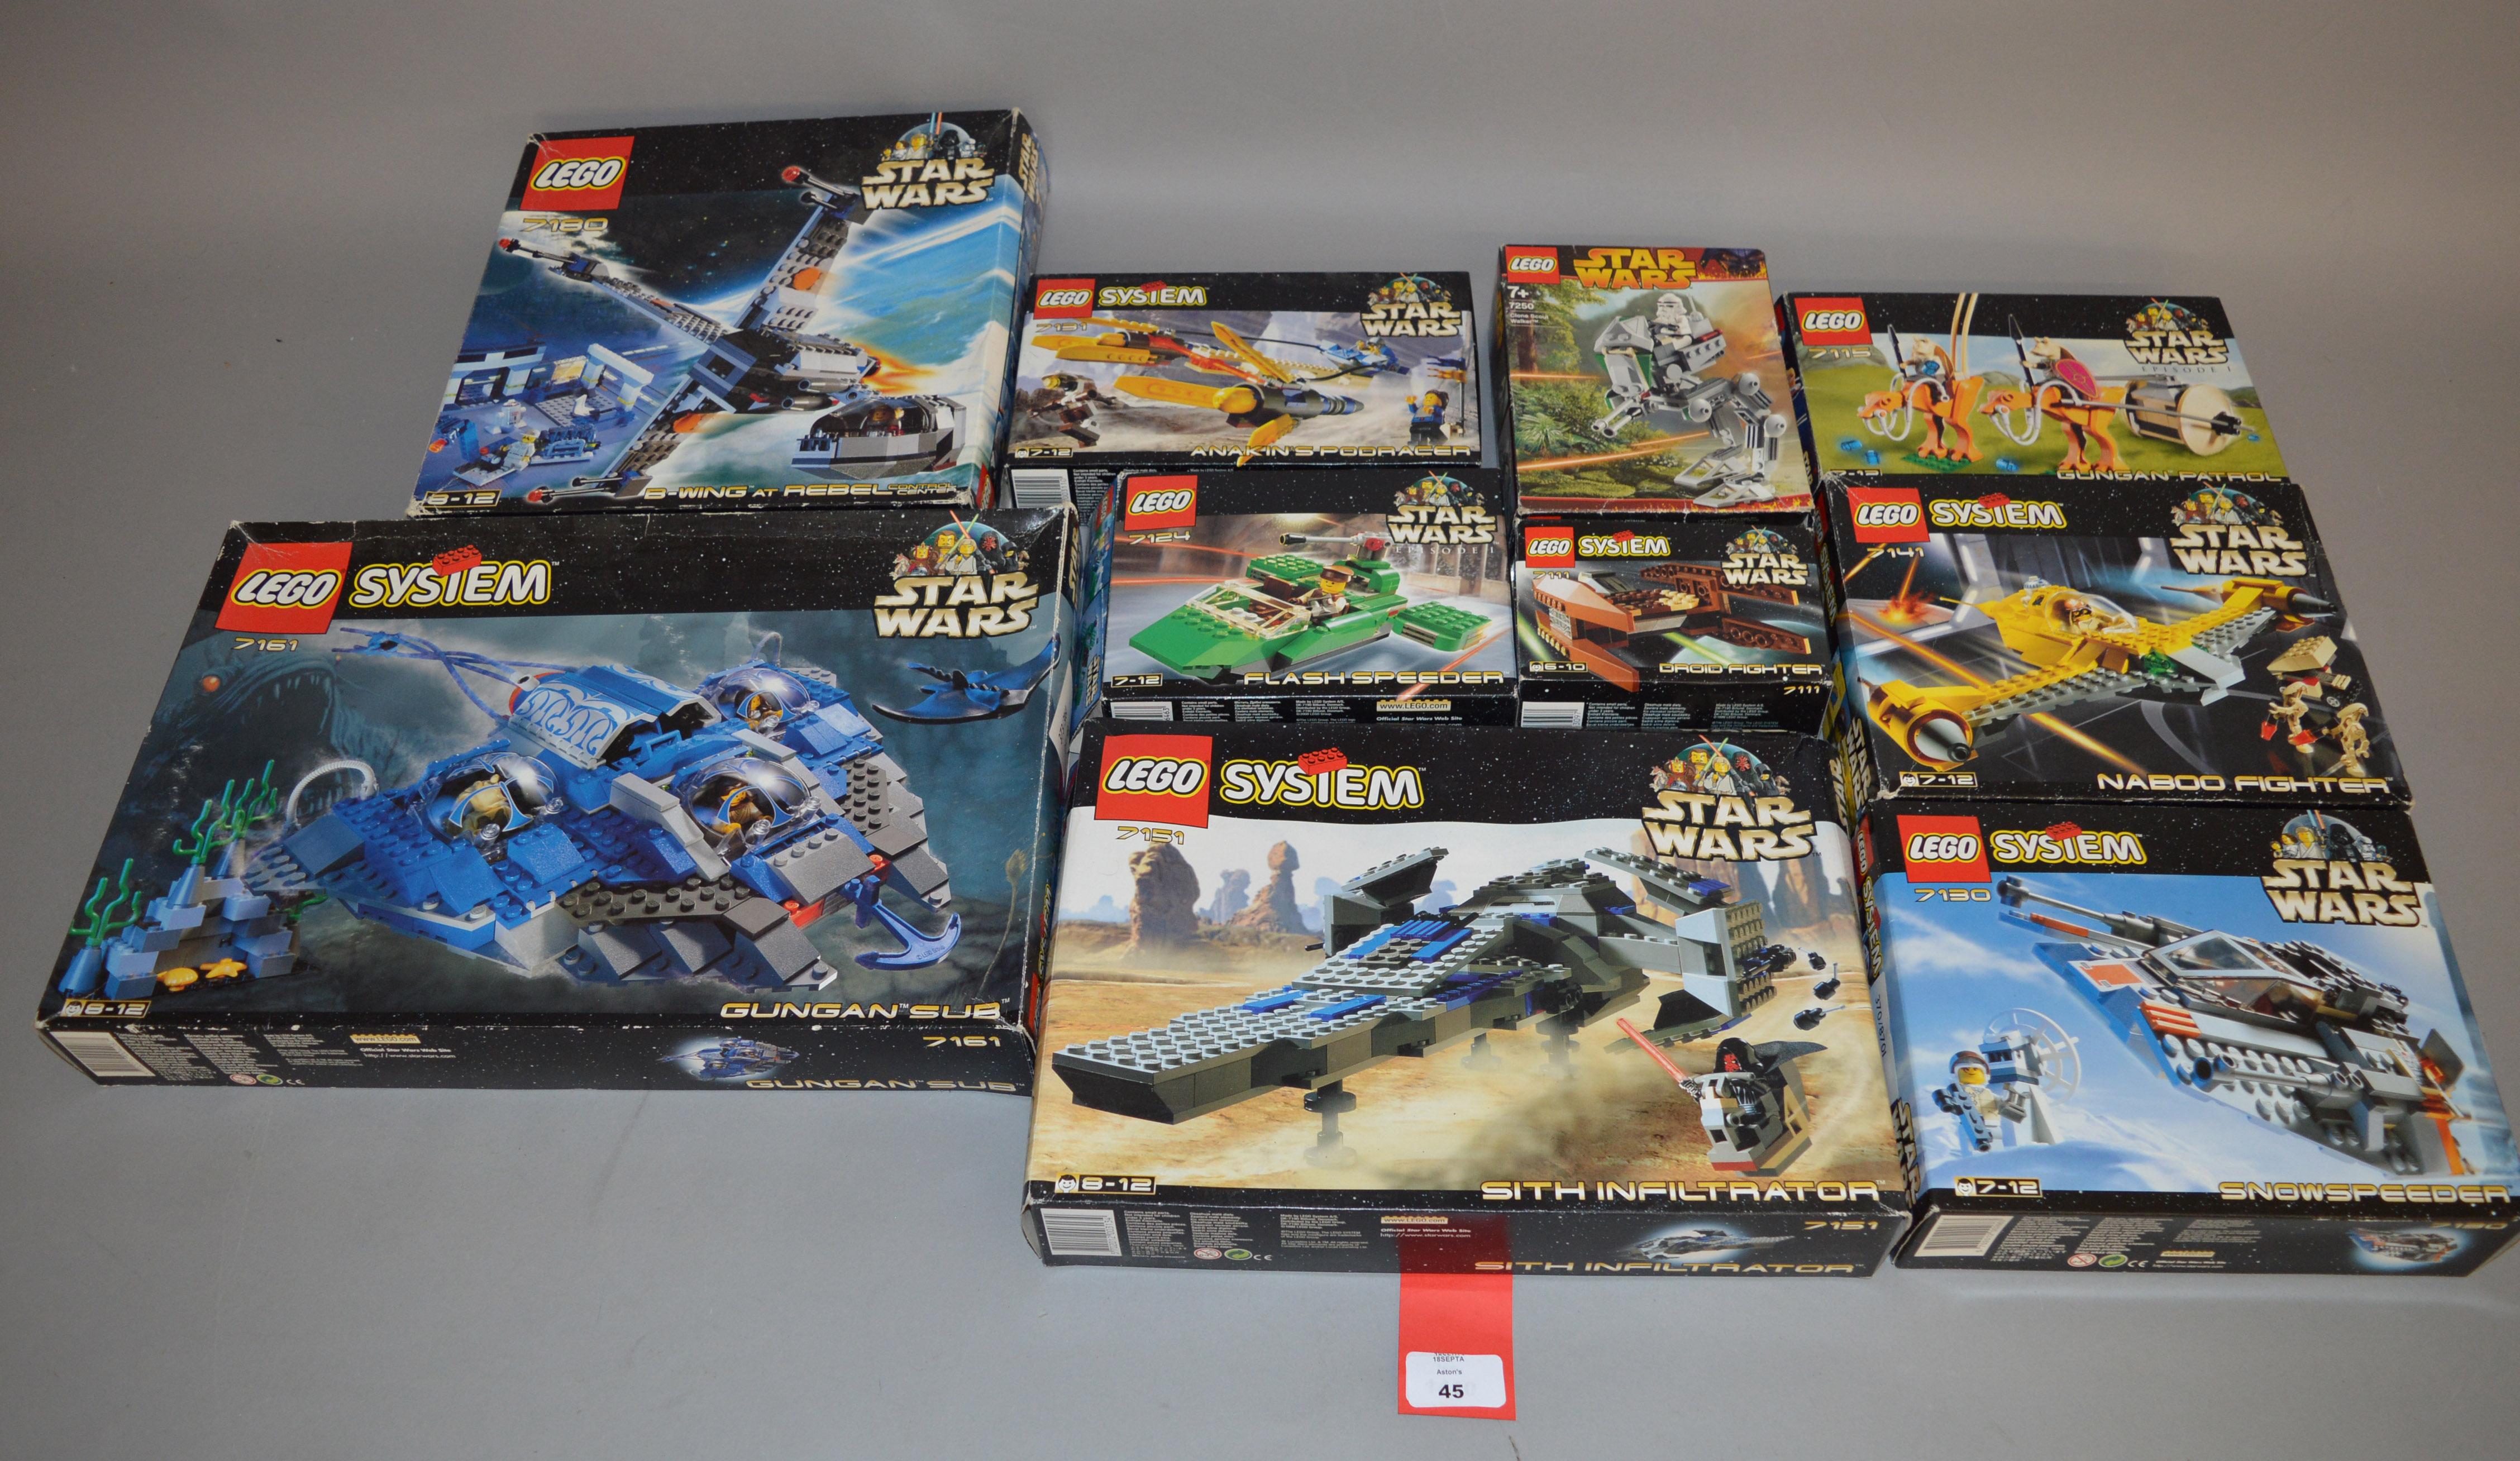 Lot 45 - 10 x Lego Star Wars sets: 7161 Gungan Sub; 7180 B-wing at Rebel Control Center; 7141 Naboo Fighter;